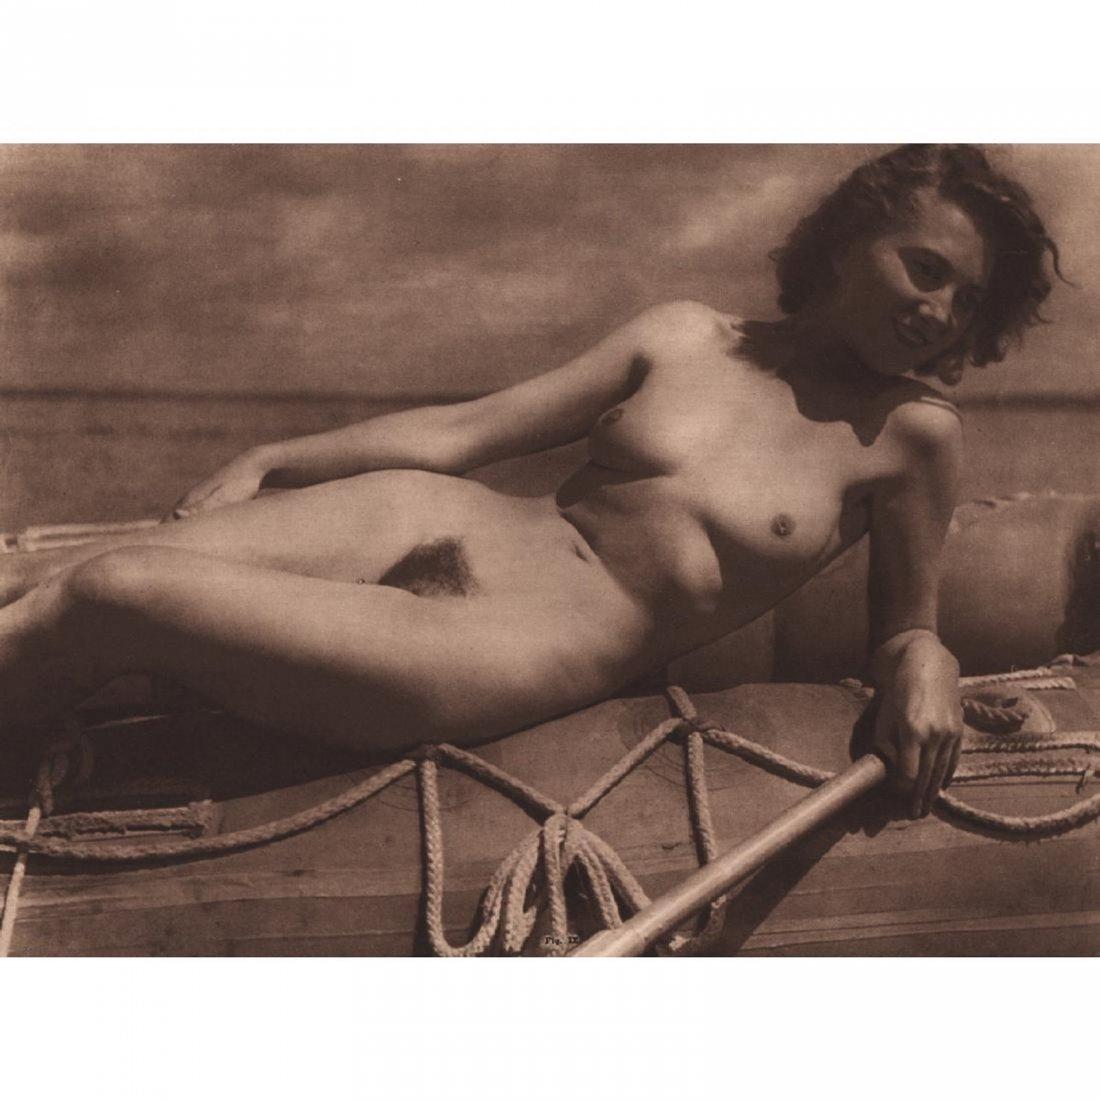 HORTS GRESCHIK - Nude - 2